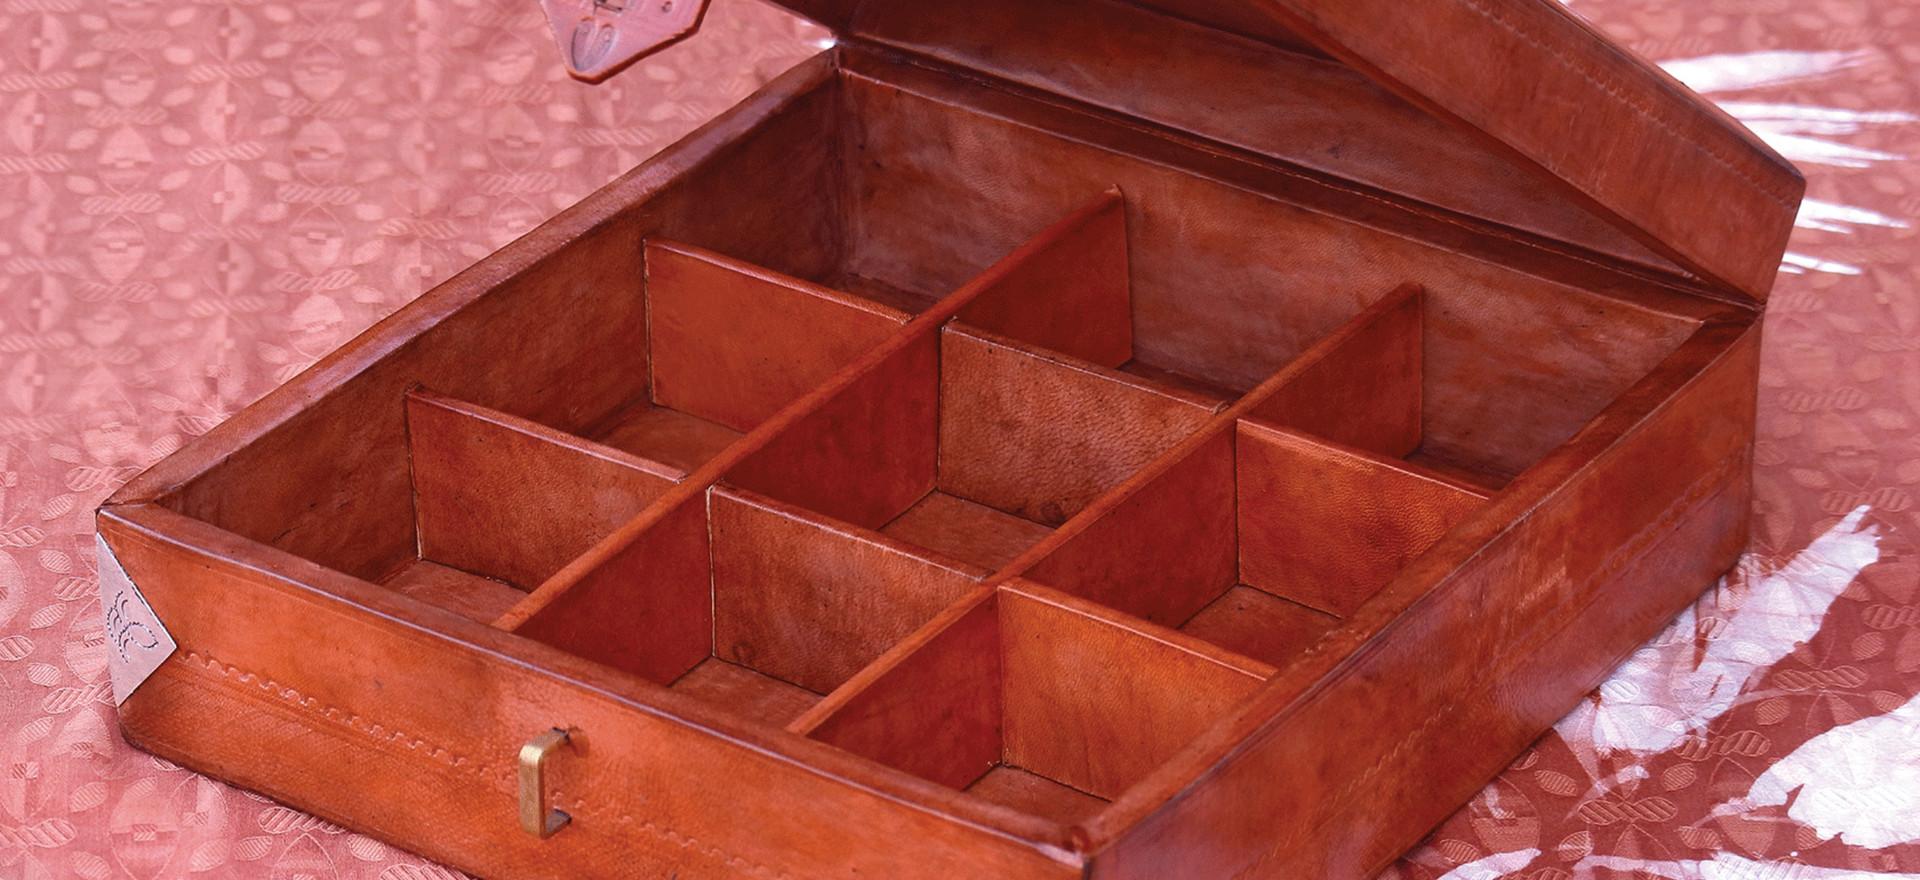 Touareg box